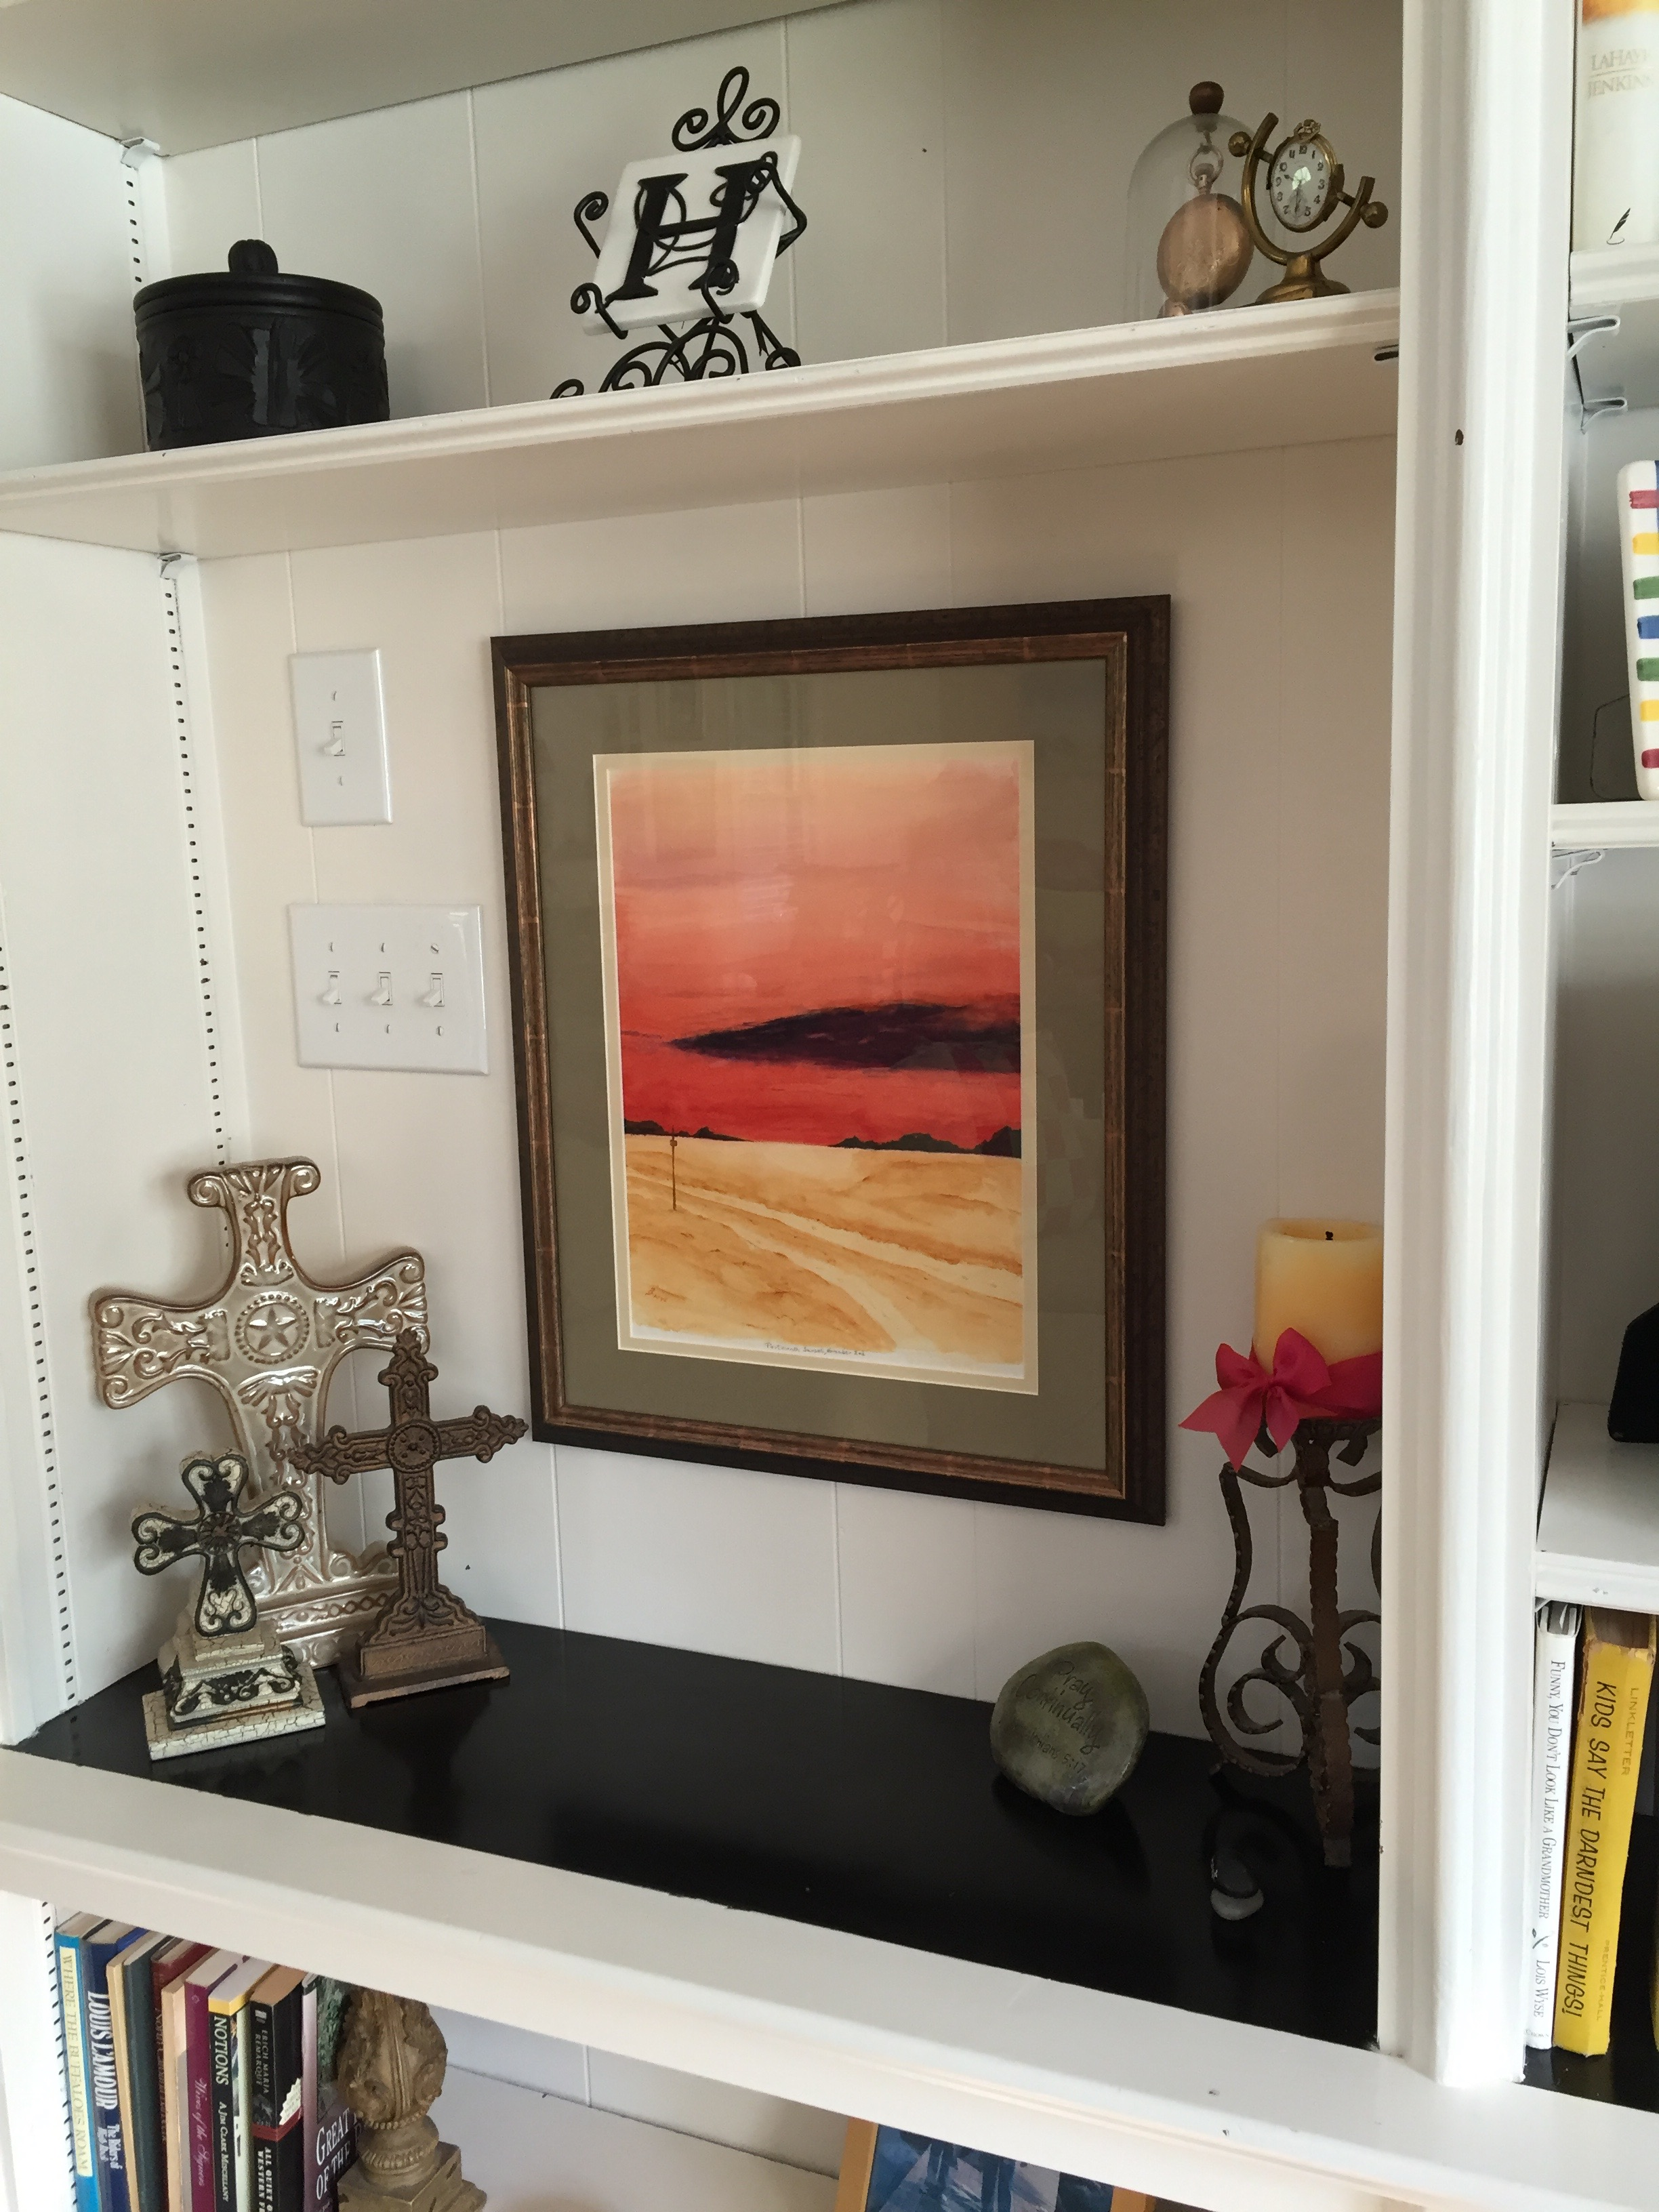 watercolor-landscape-portsmouth-phyllis-sharpe-IMG_2176.jpg